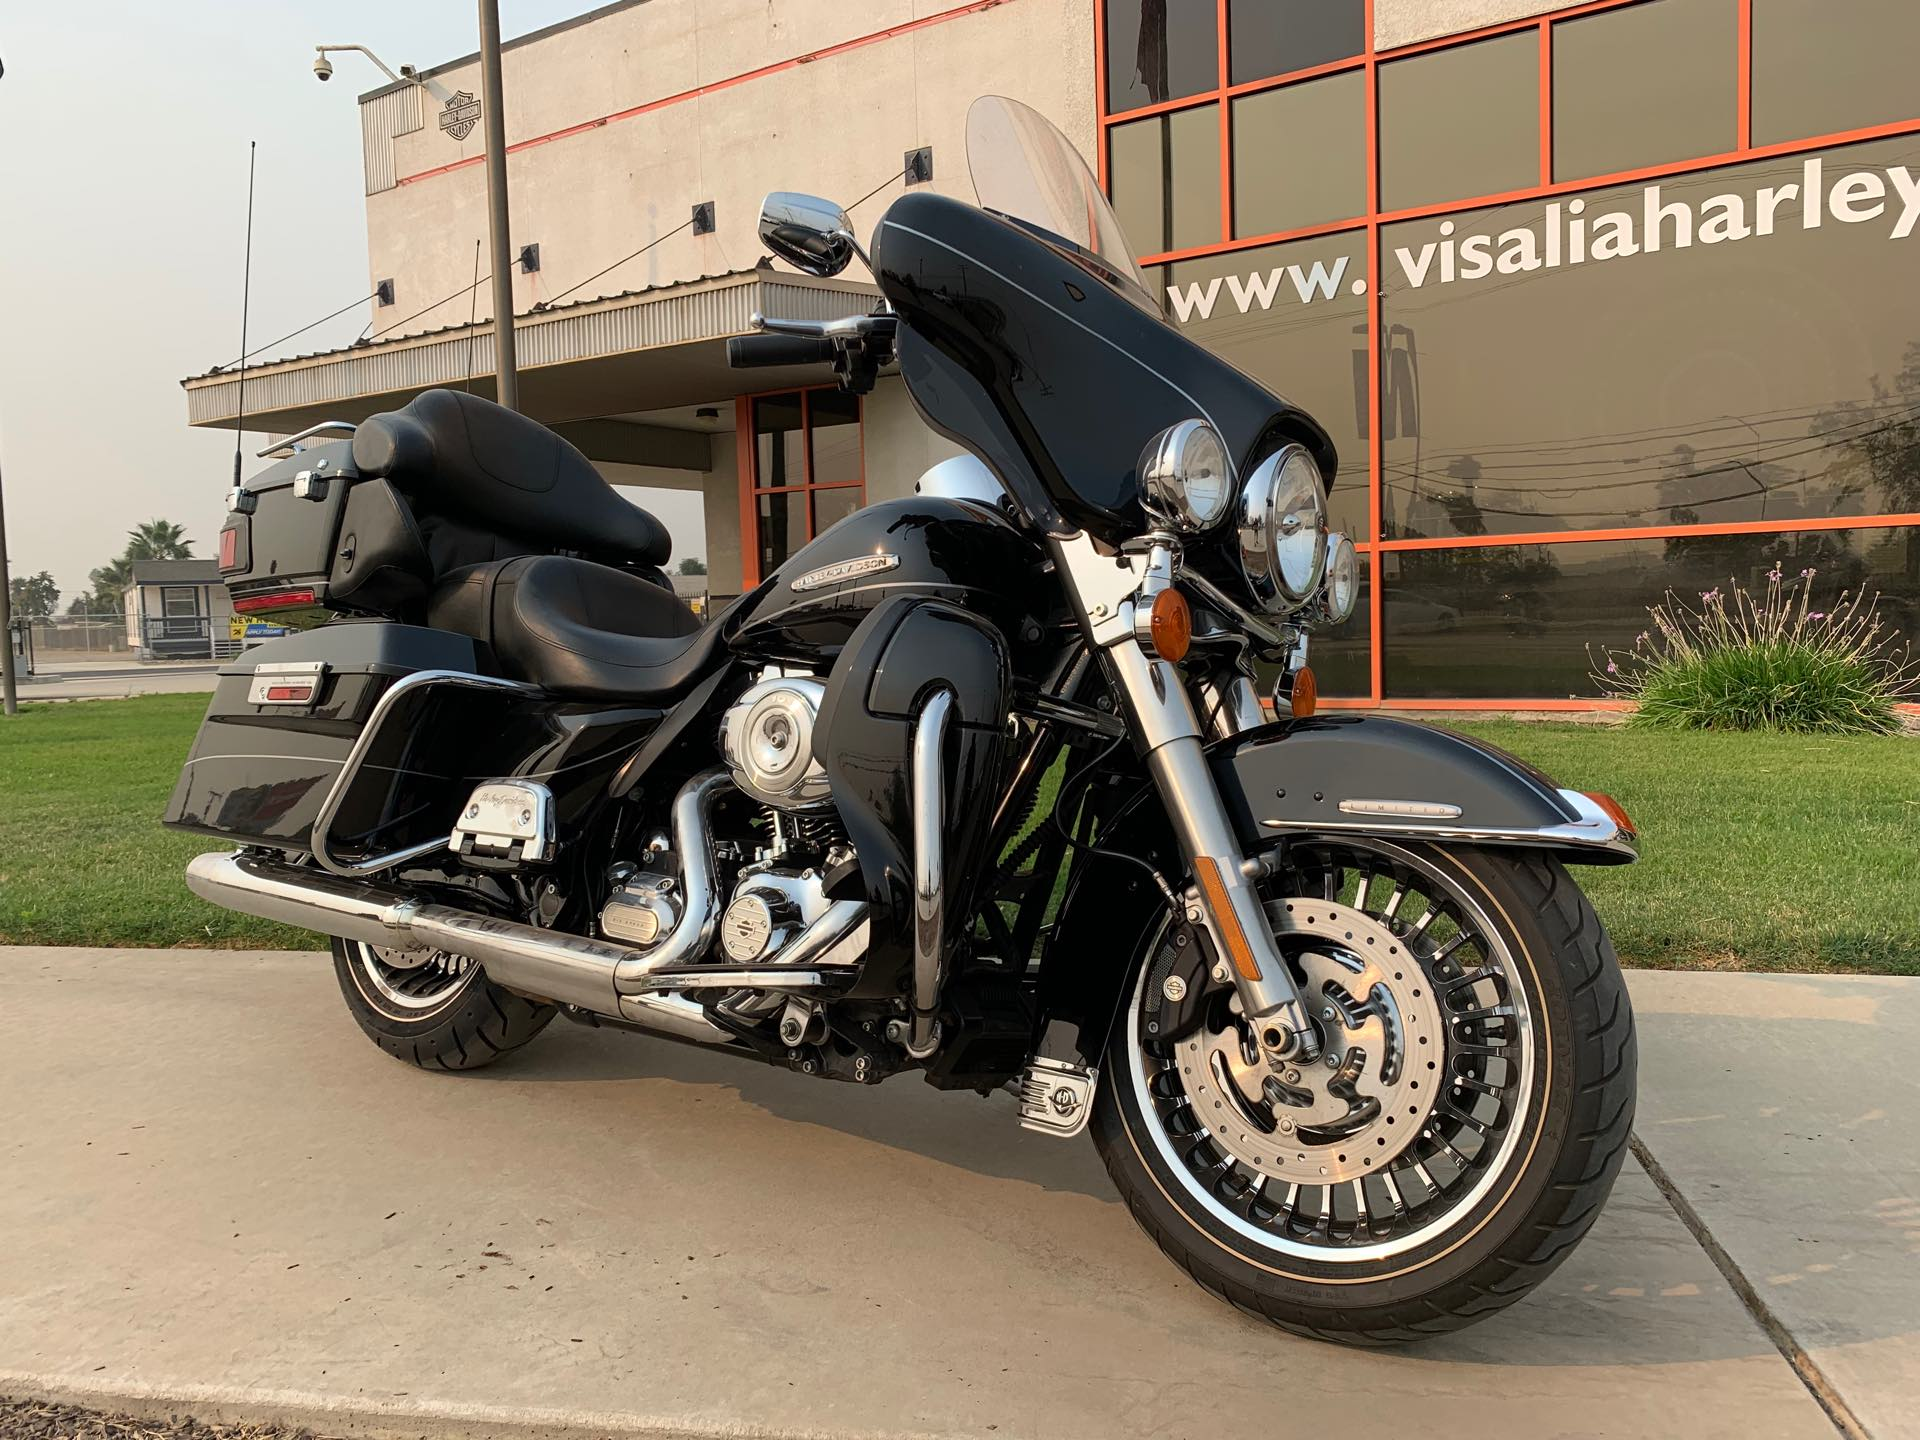 2012 Harley-Davidson Electra Glide Ultra Limited at Visalia Harley-Davidson